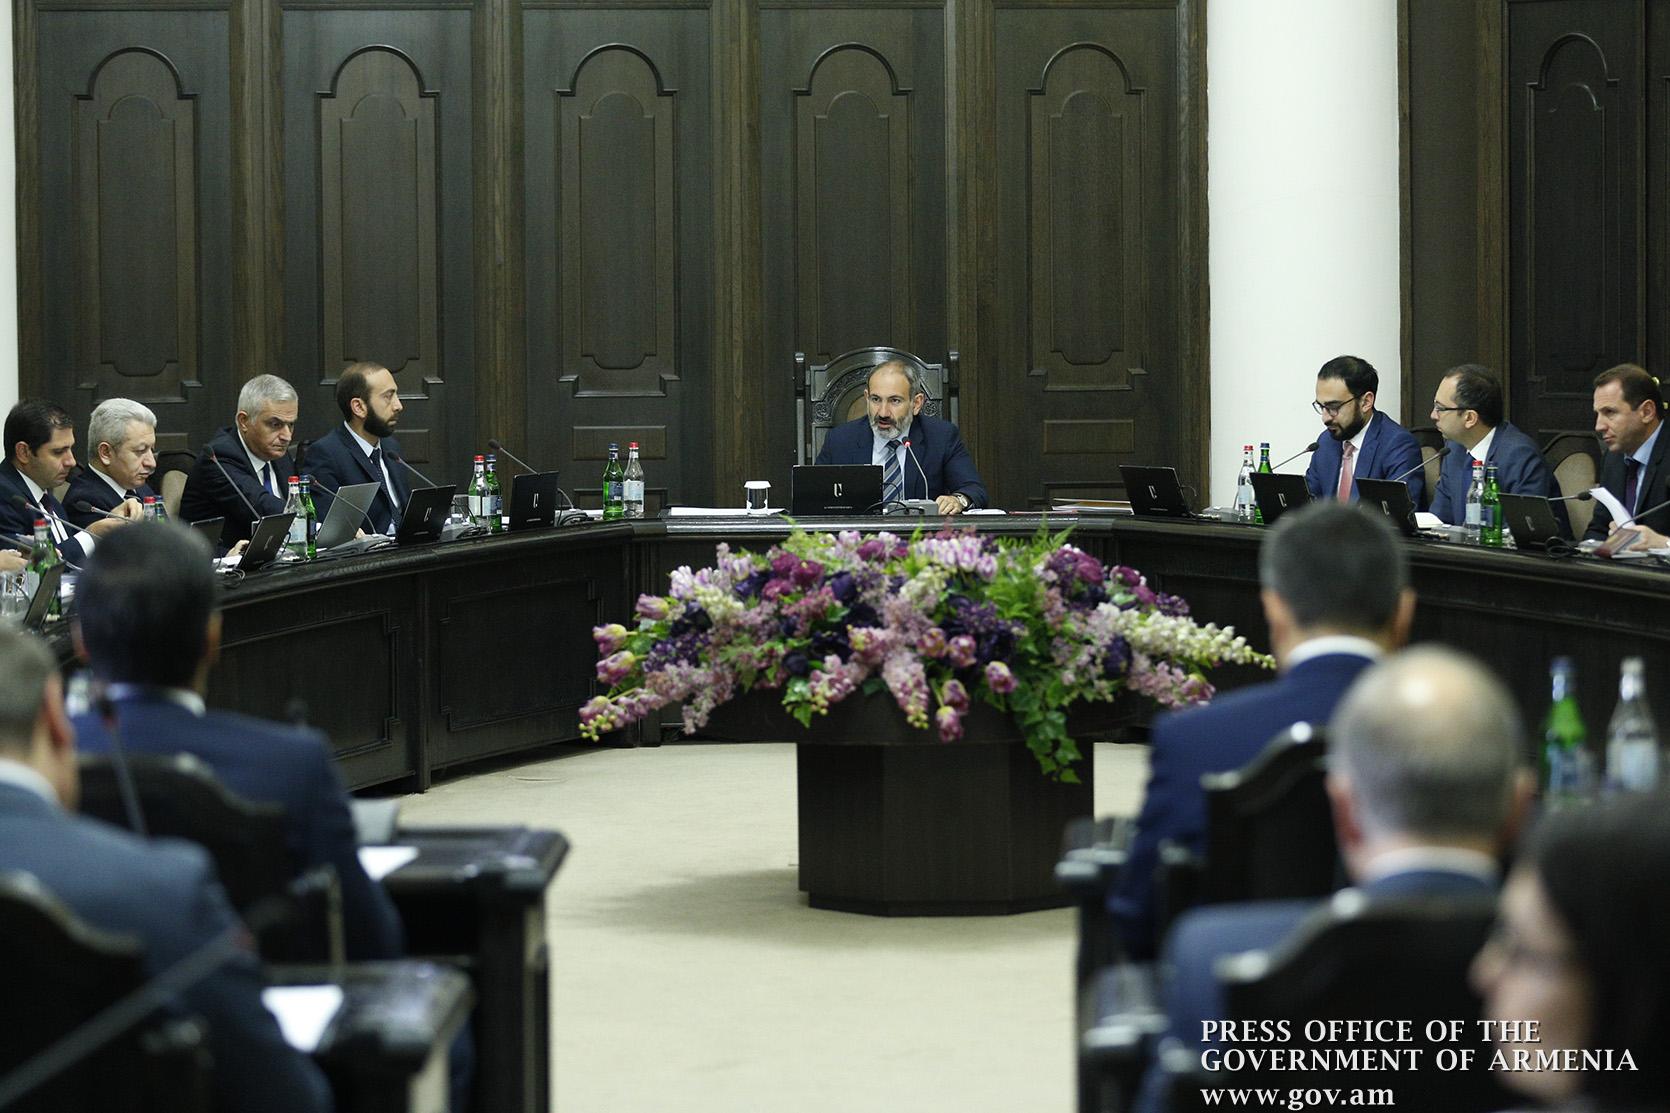 Photo of Մեկնարկել է կառավարության նիստը. օրակարգում 24 հարց կա. ՈՒՂԻՂ